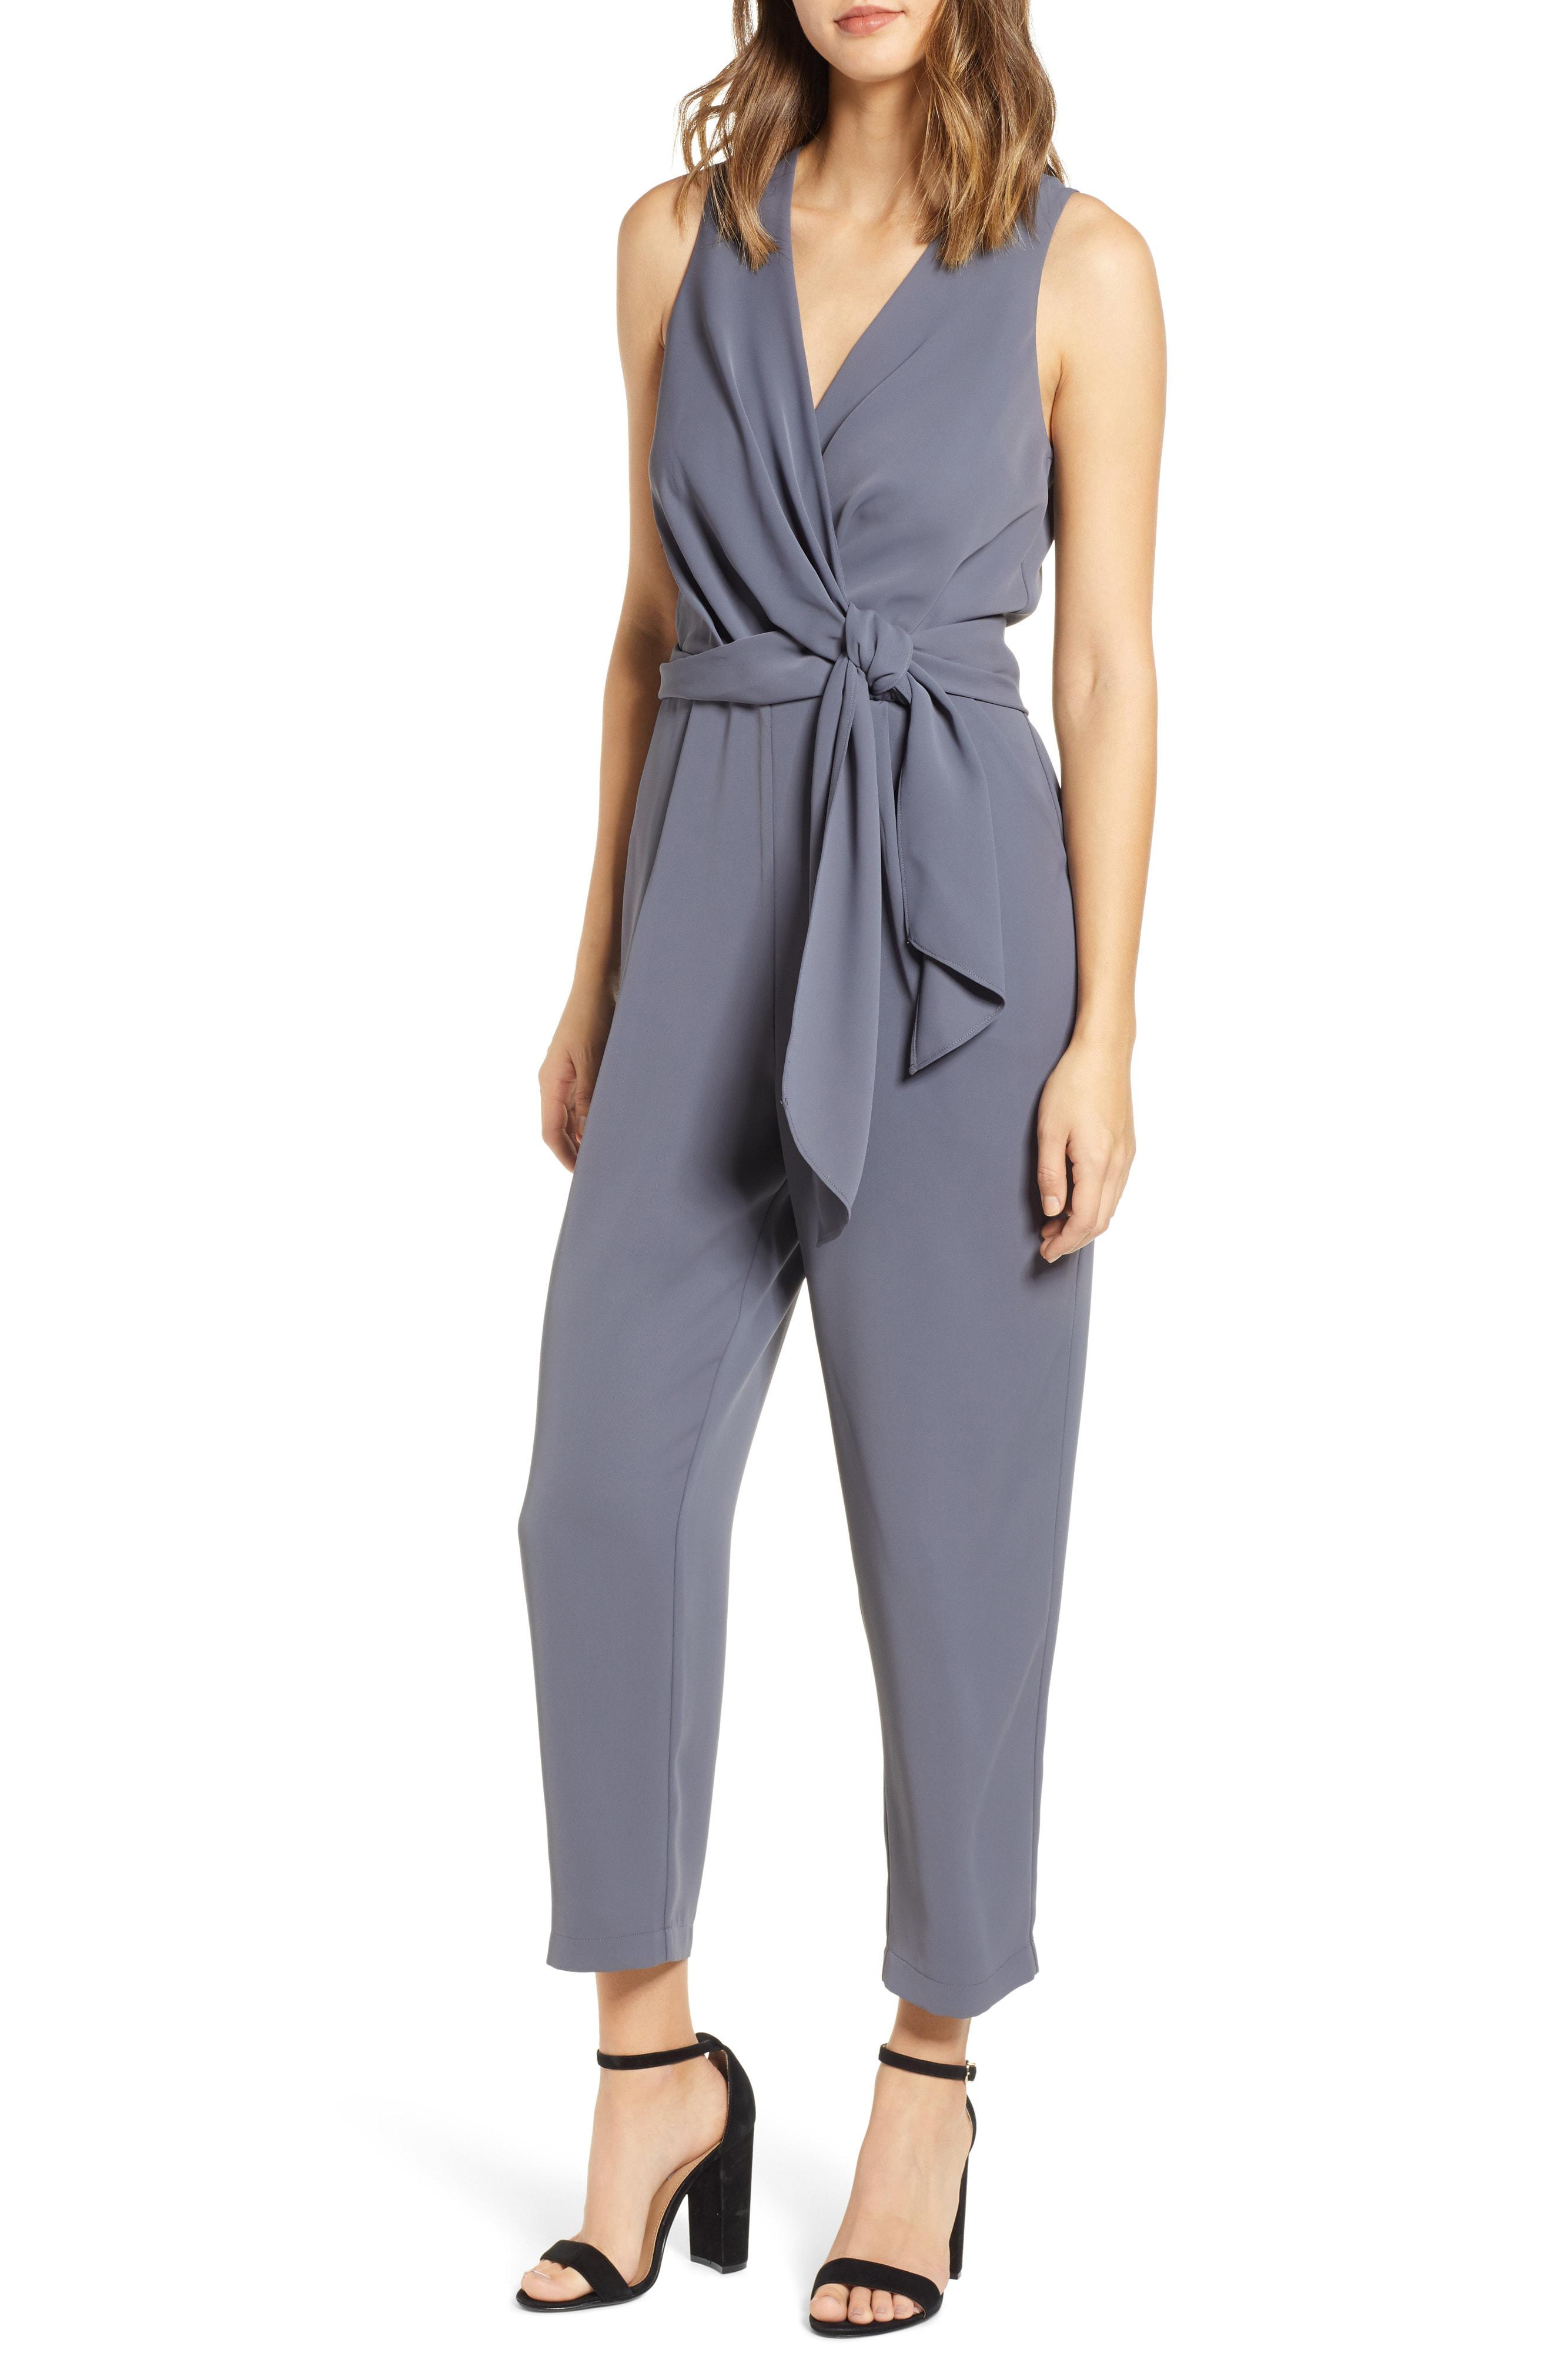 e66afc790f005 Astr Side Tie Jumpsuit In Grey | ModeSens